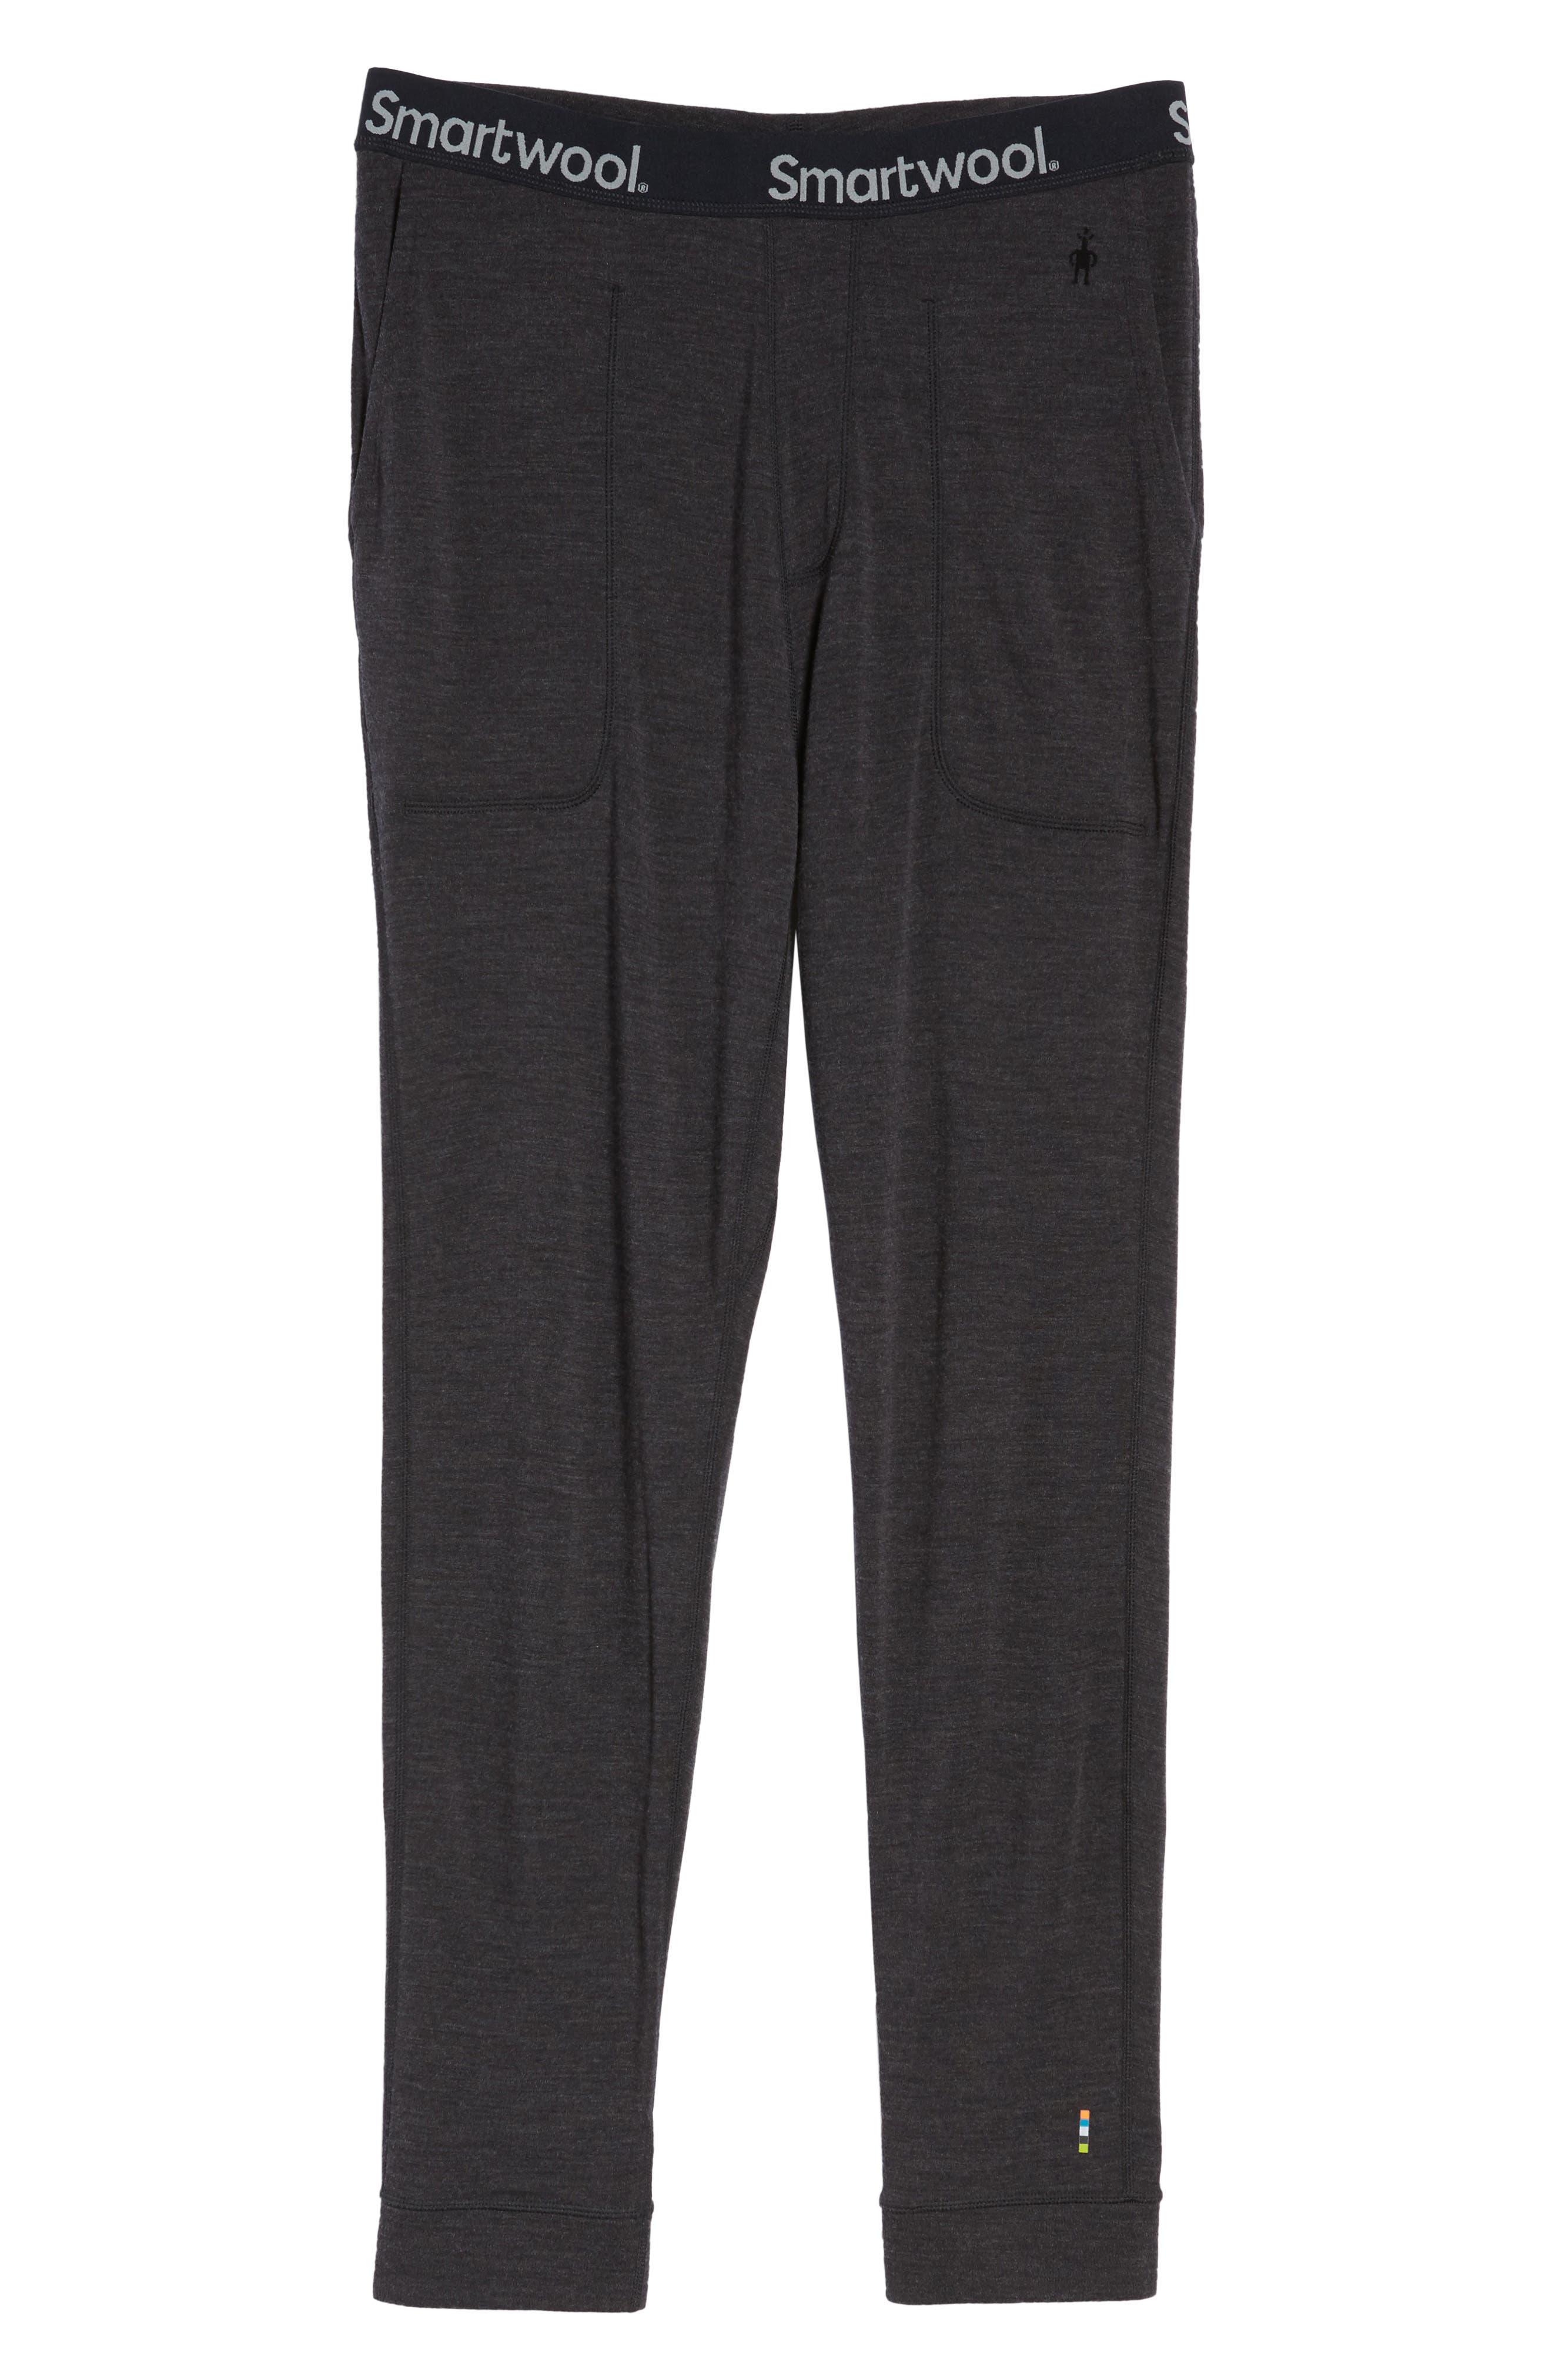 250 Merino Wool Jogger Pants,                             Alternate thumbnail 6, color,                             CHARCOAL